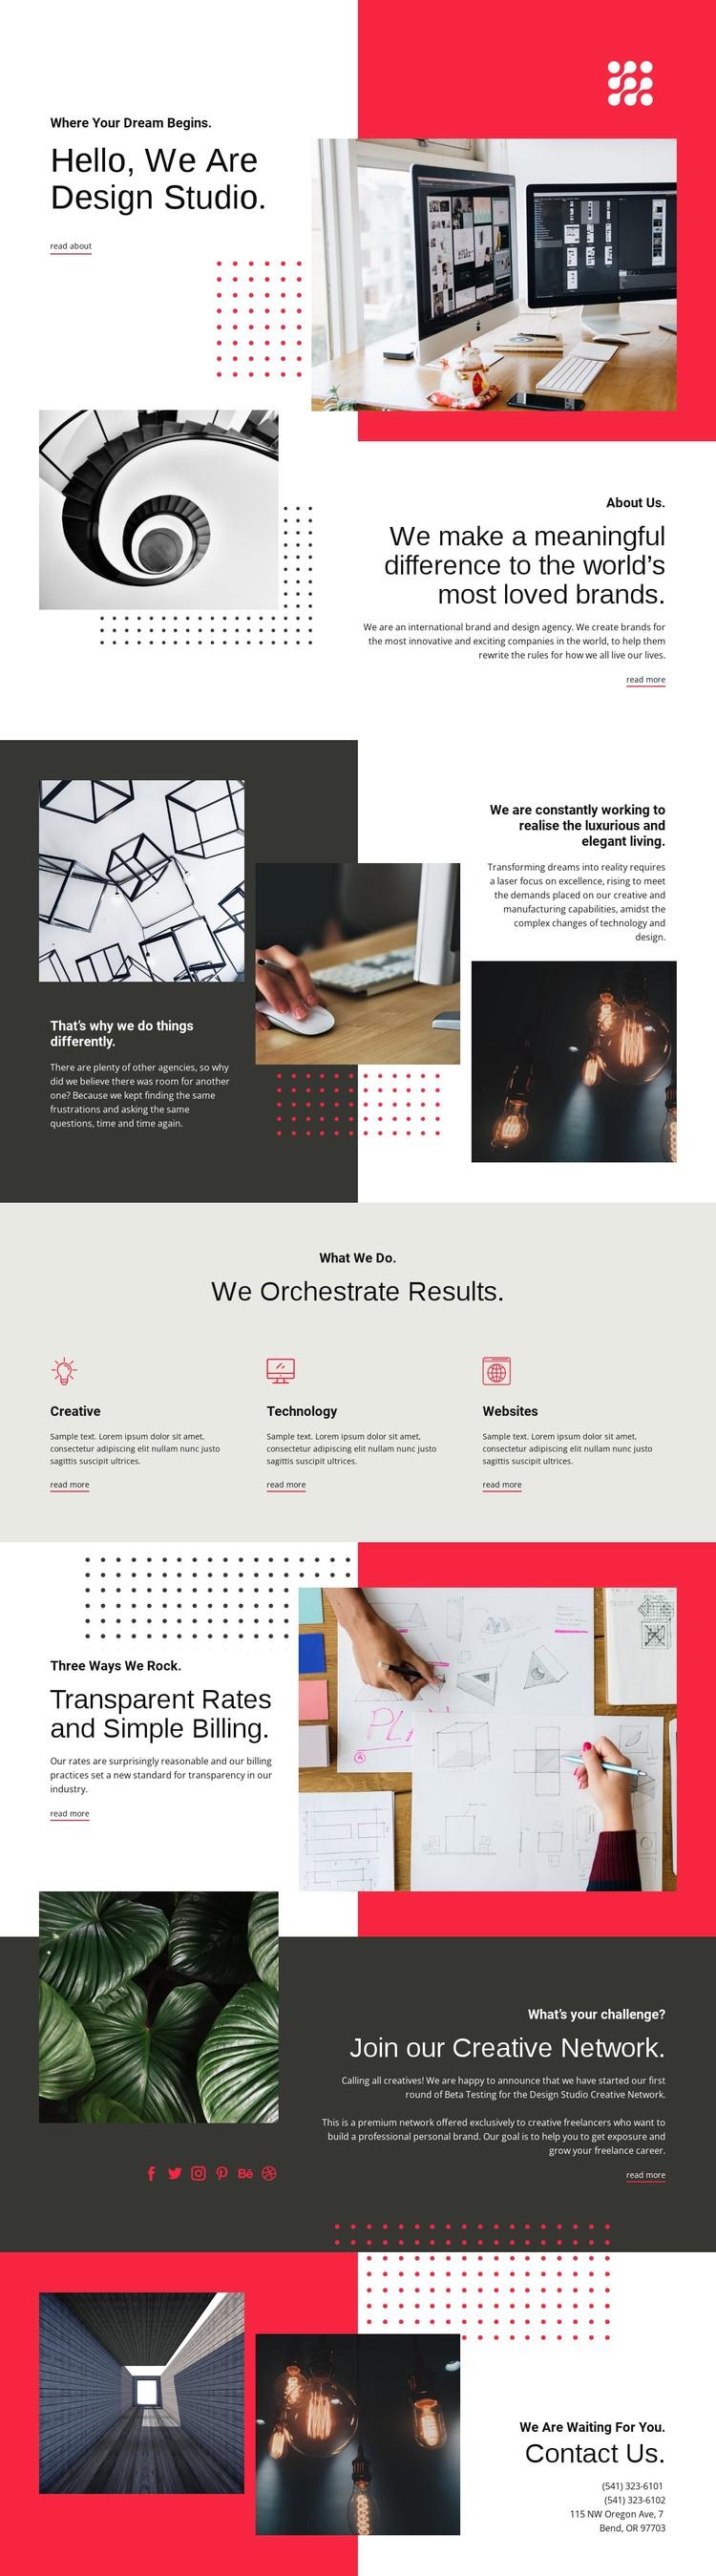 Design Studio WordPress Template